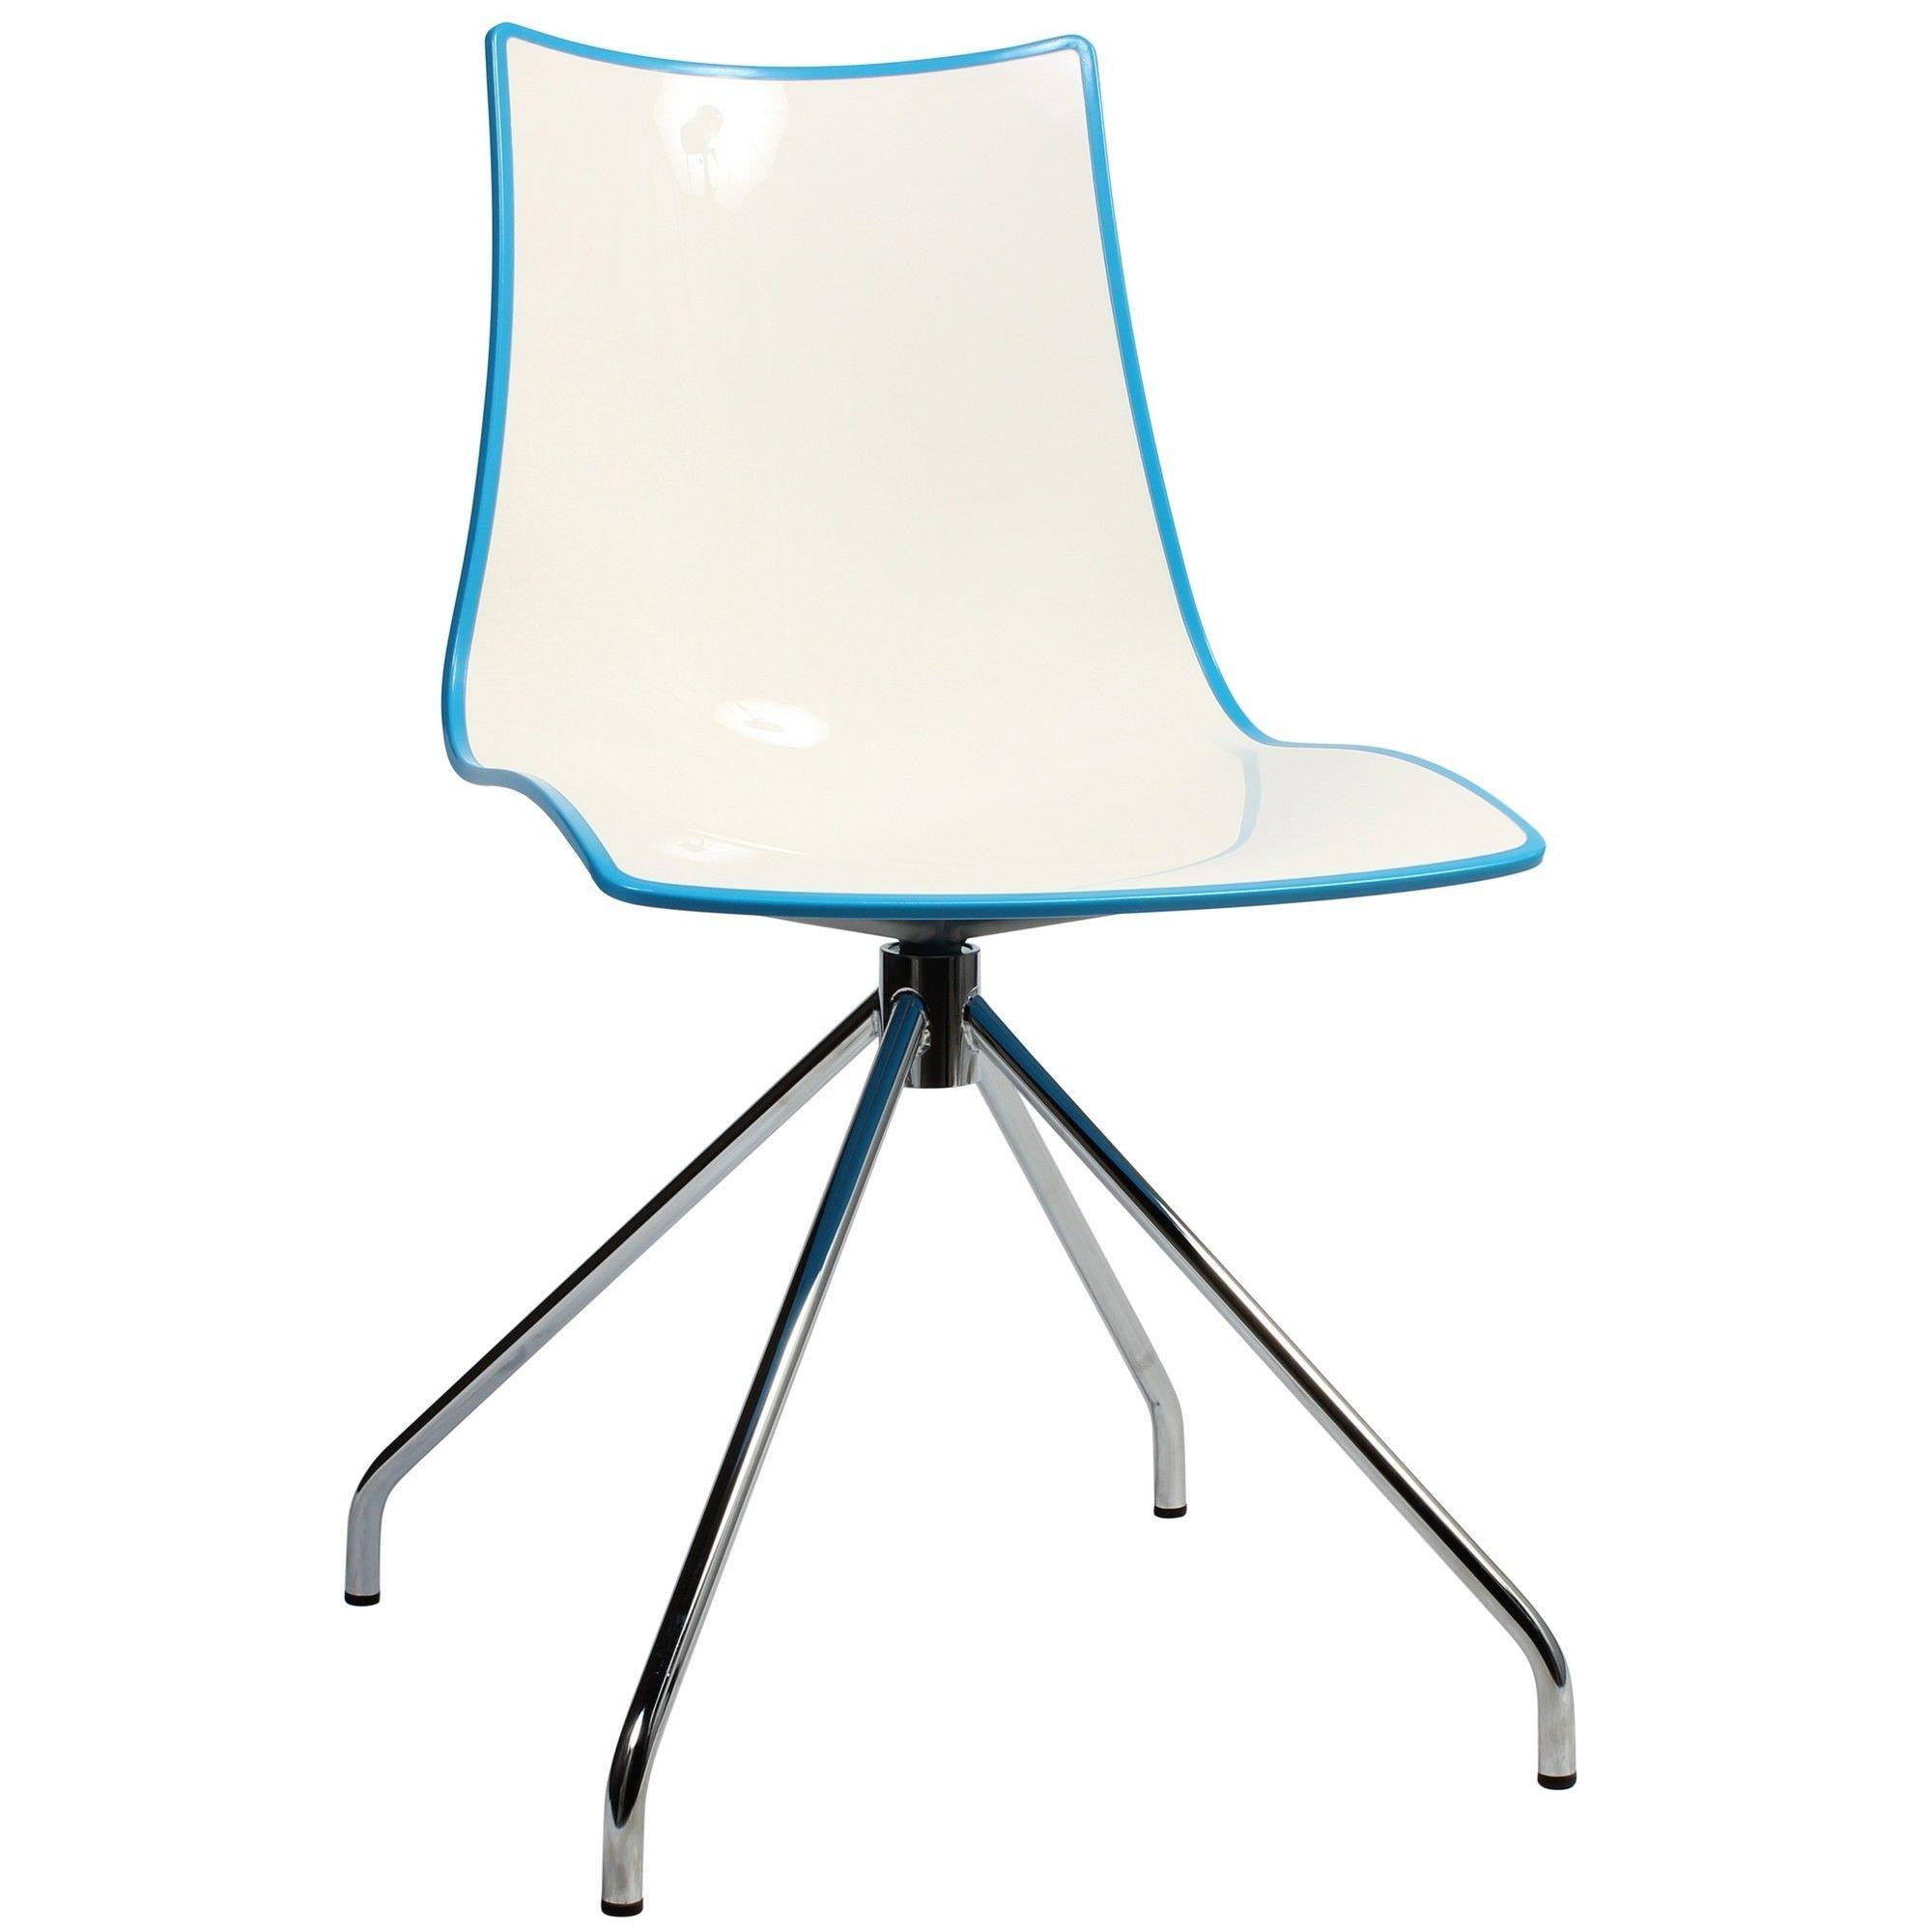 Zebra Bicolore Italian Made Commercial Grade Dining Chair, Trestle Leg, Blue / Chrome